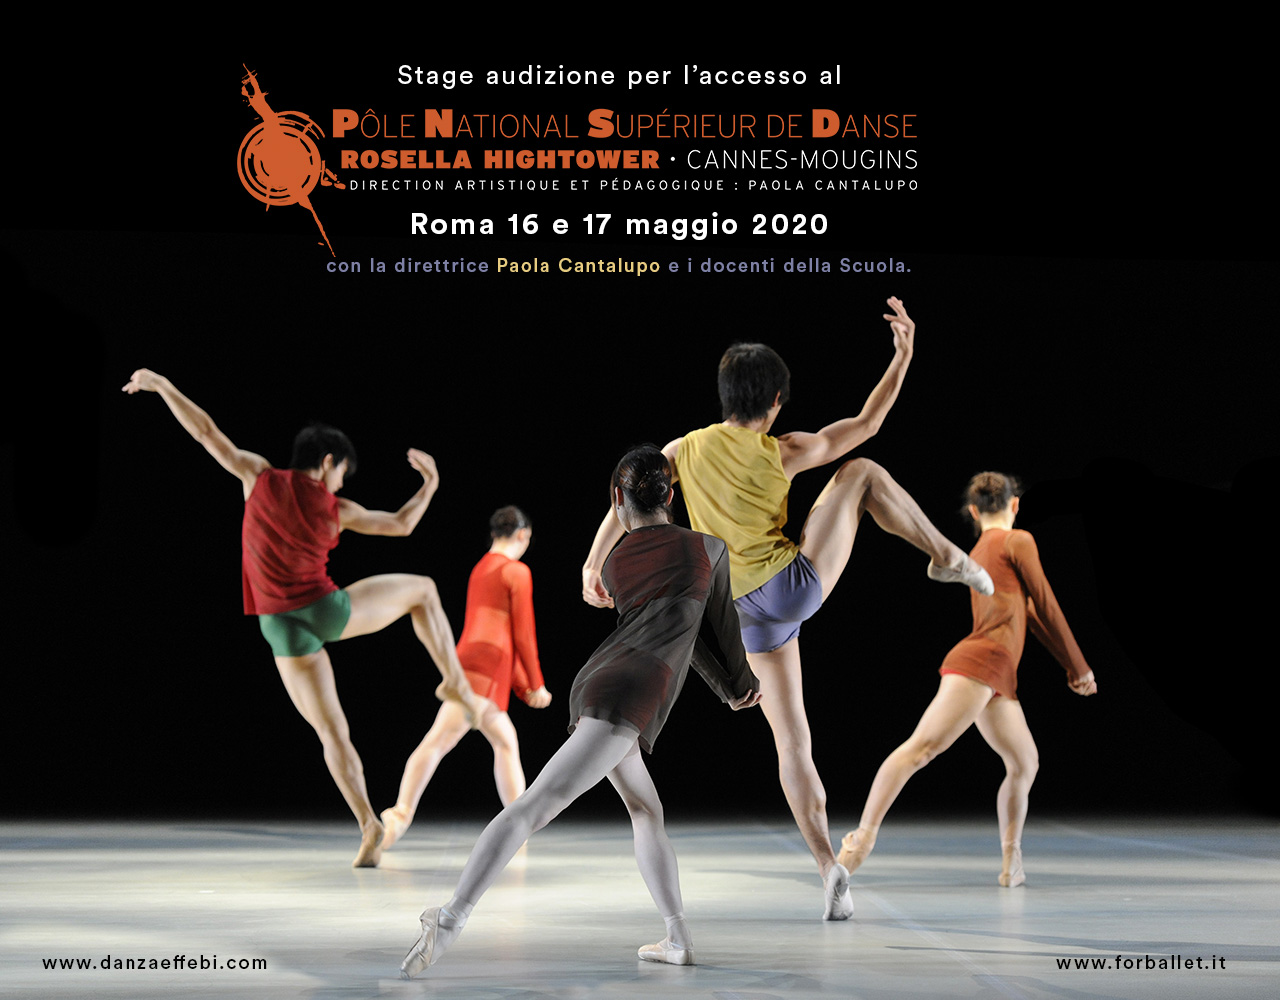 Stage audizione per ammissione a Cannes